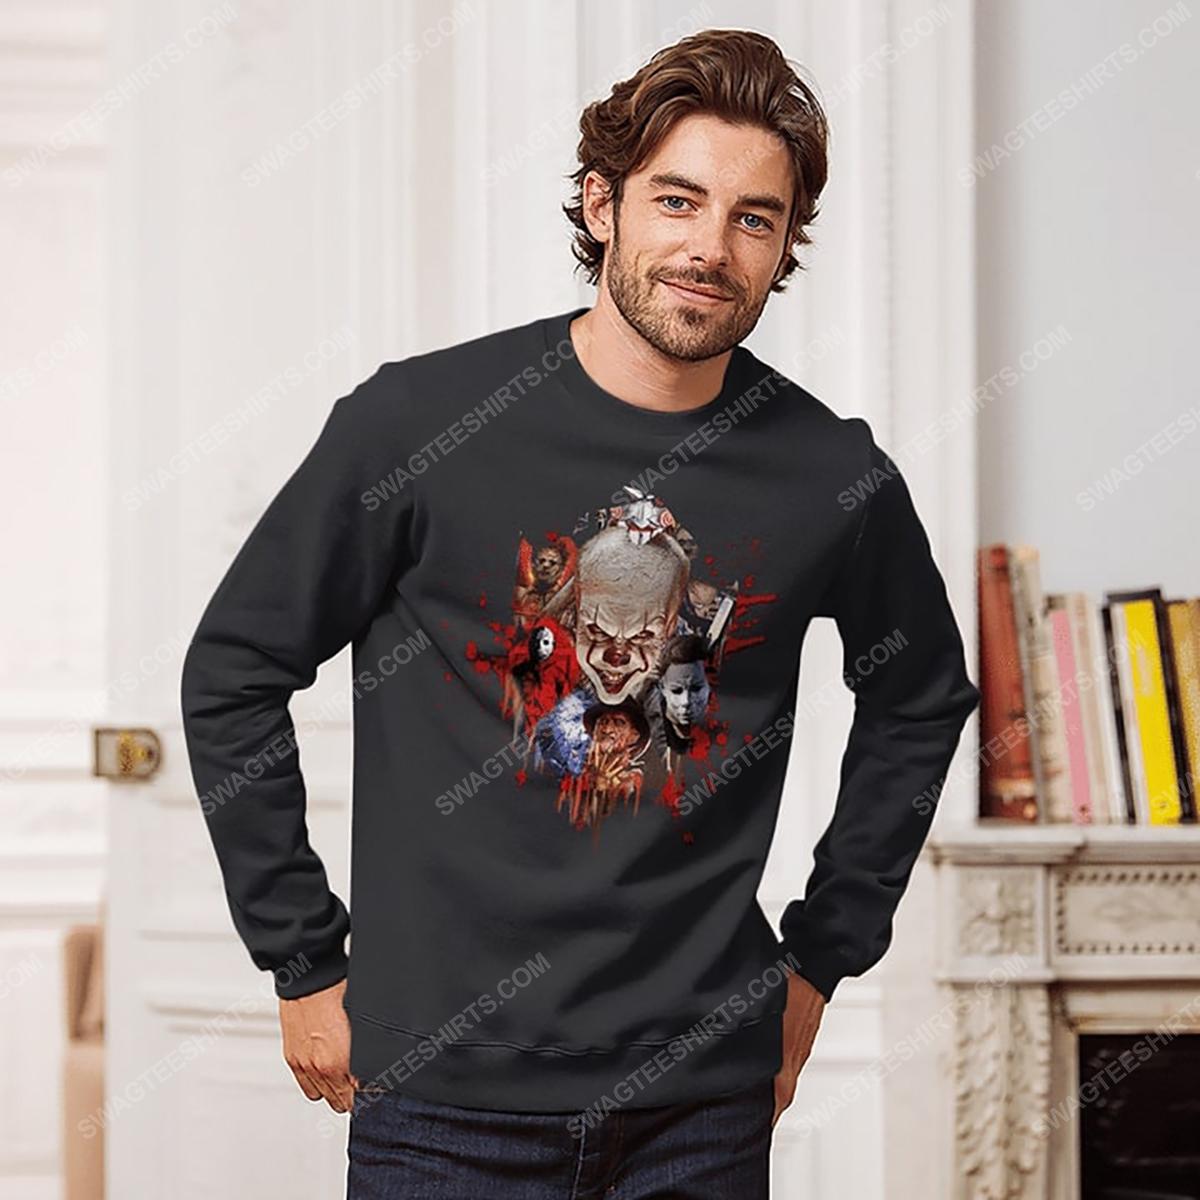 Halloween night horror movie villains with bloody sweatshirt 1(1)